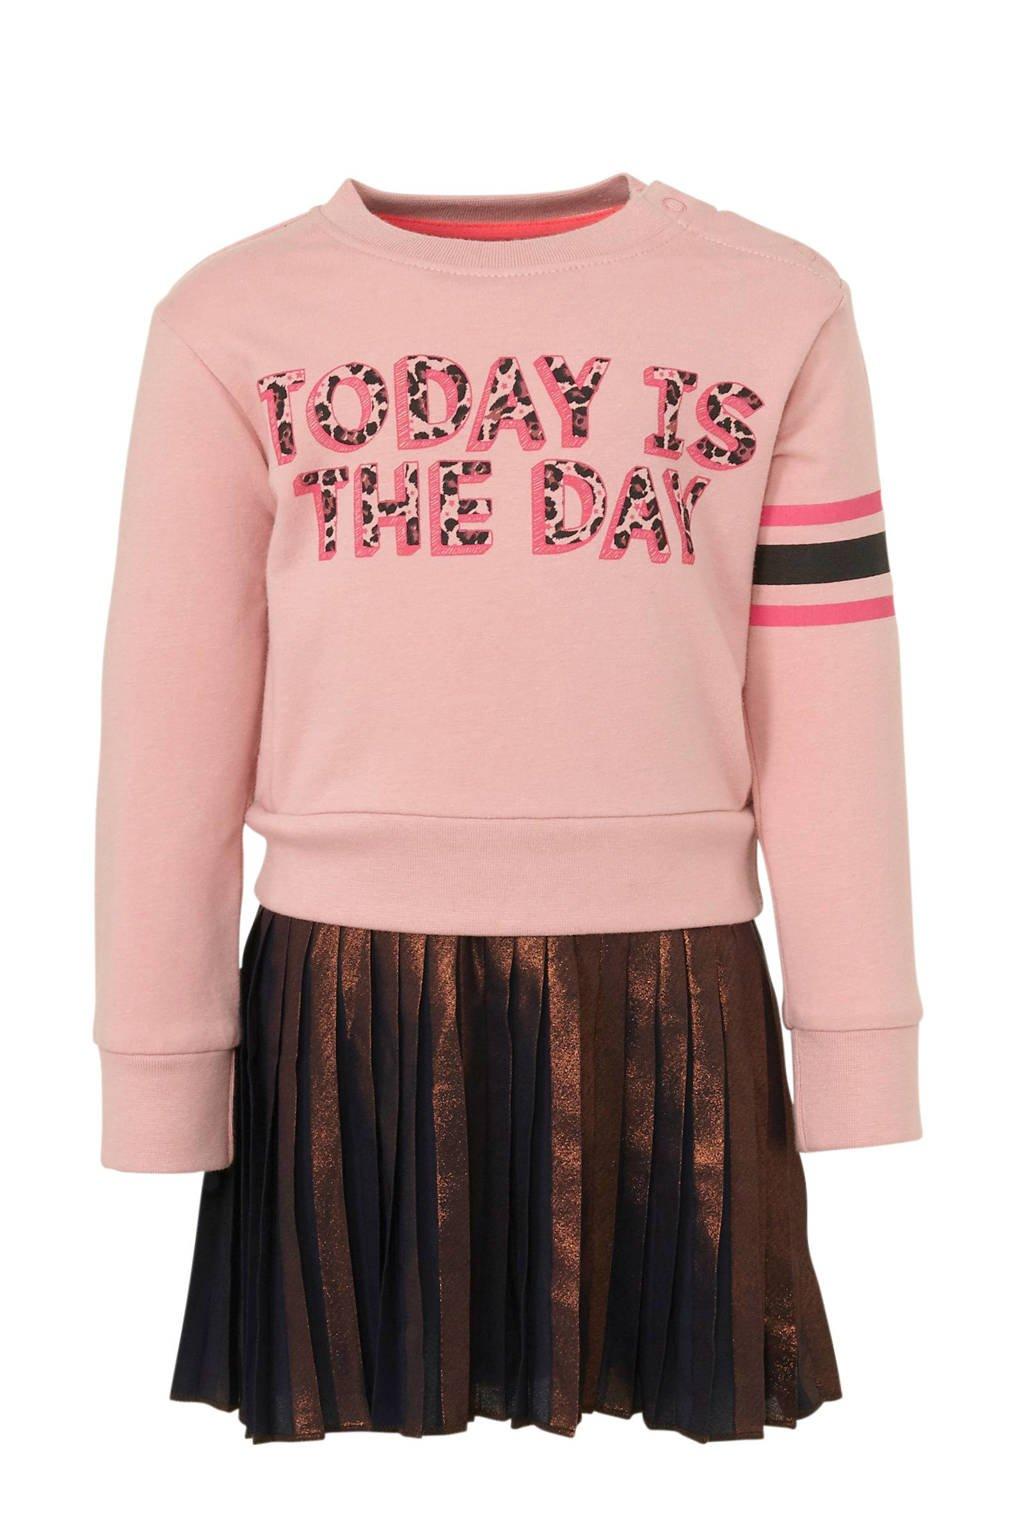 Beebielove jurk met tekst roze, Roze/bruin/zwarty